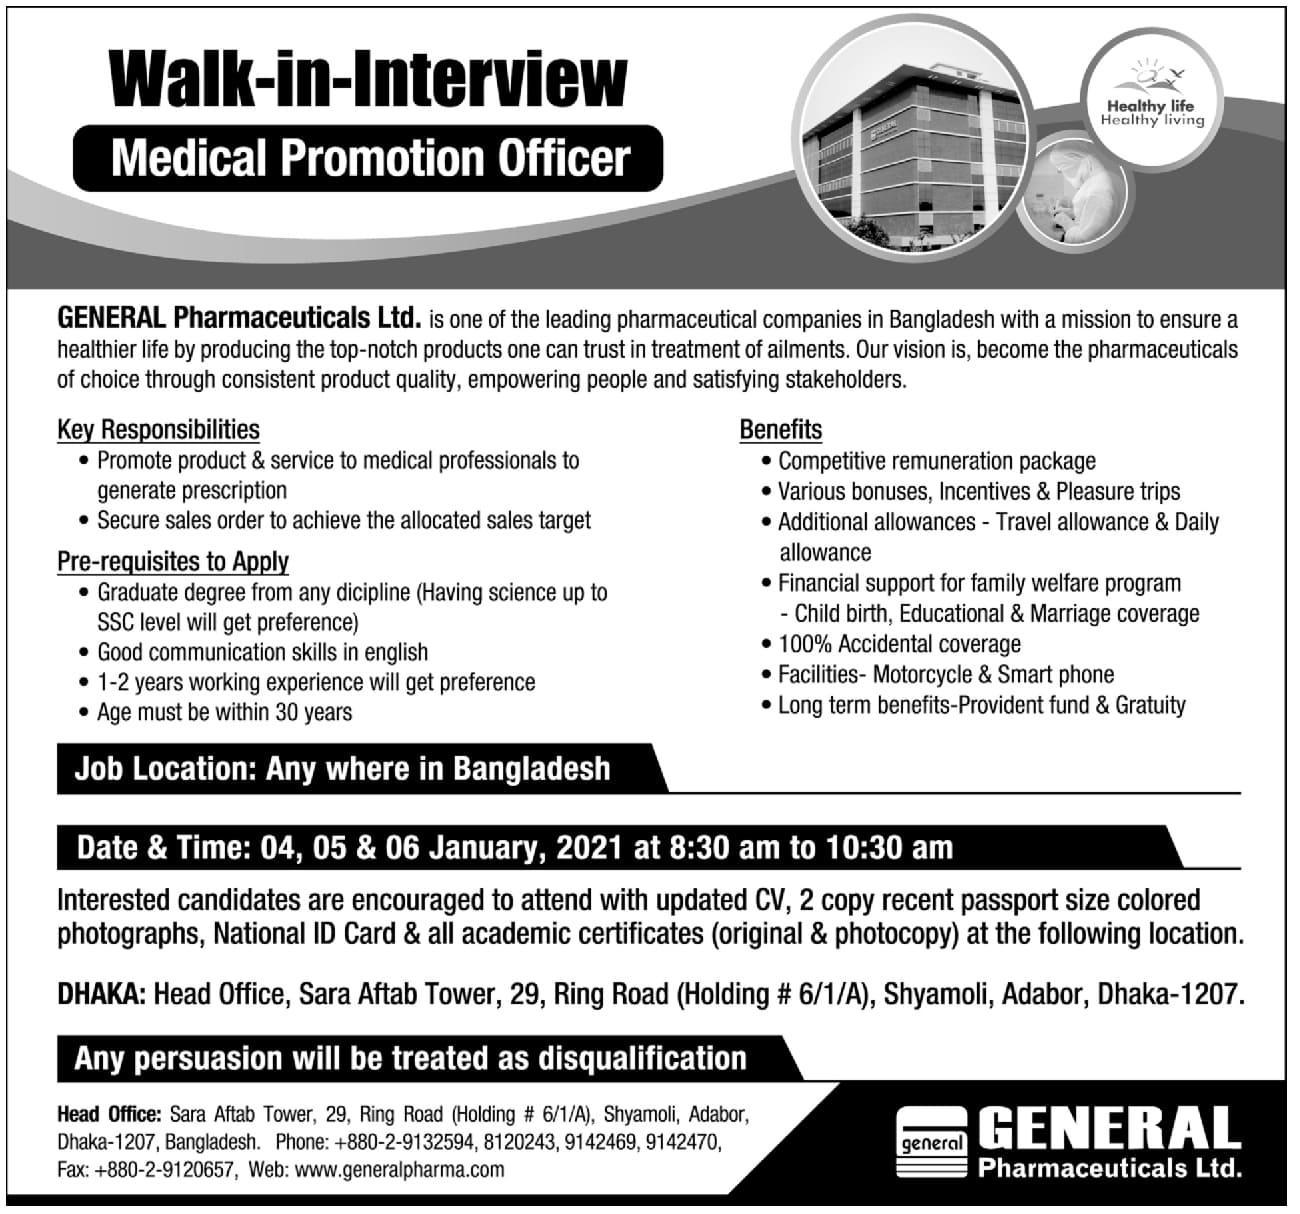 General Pharmaceuticals Ltd Job Circular 2021